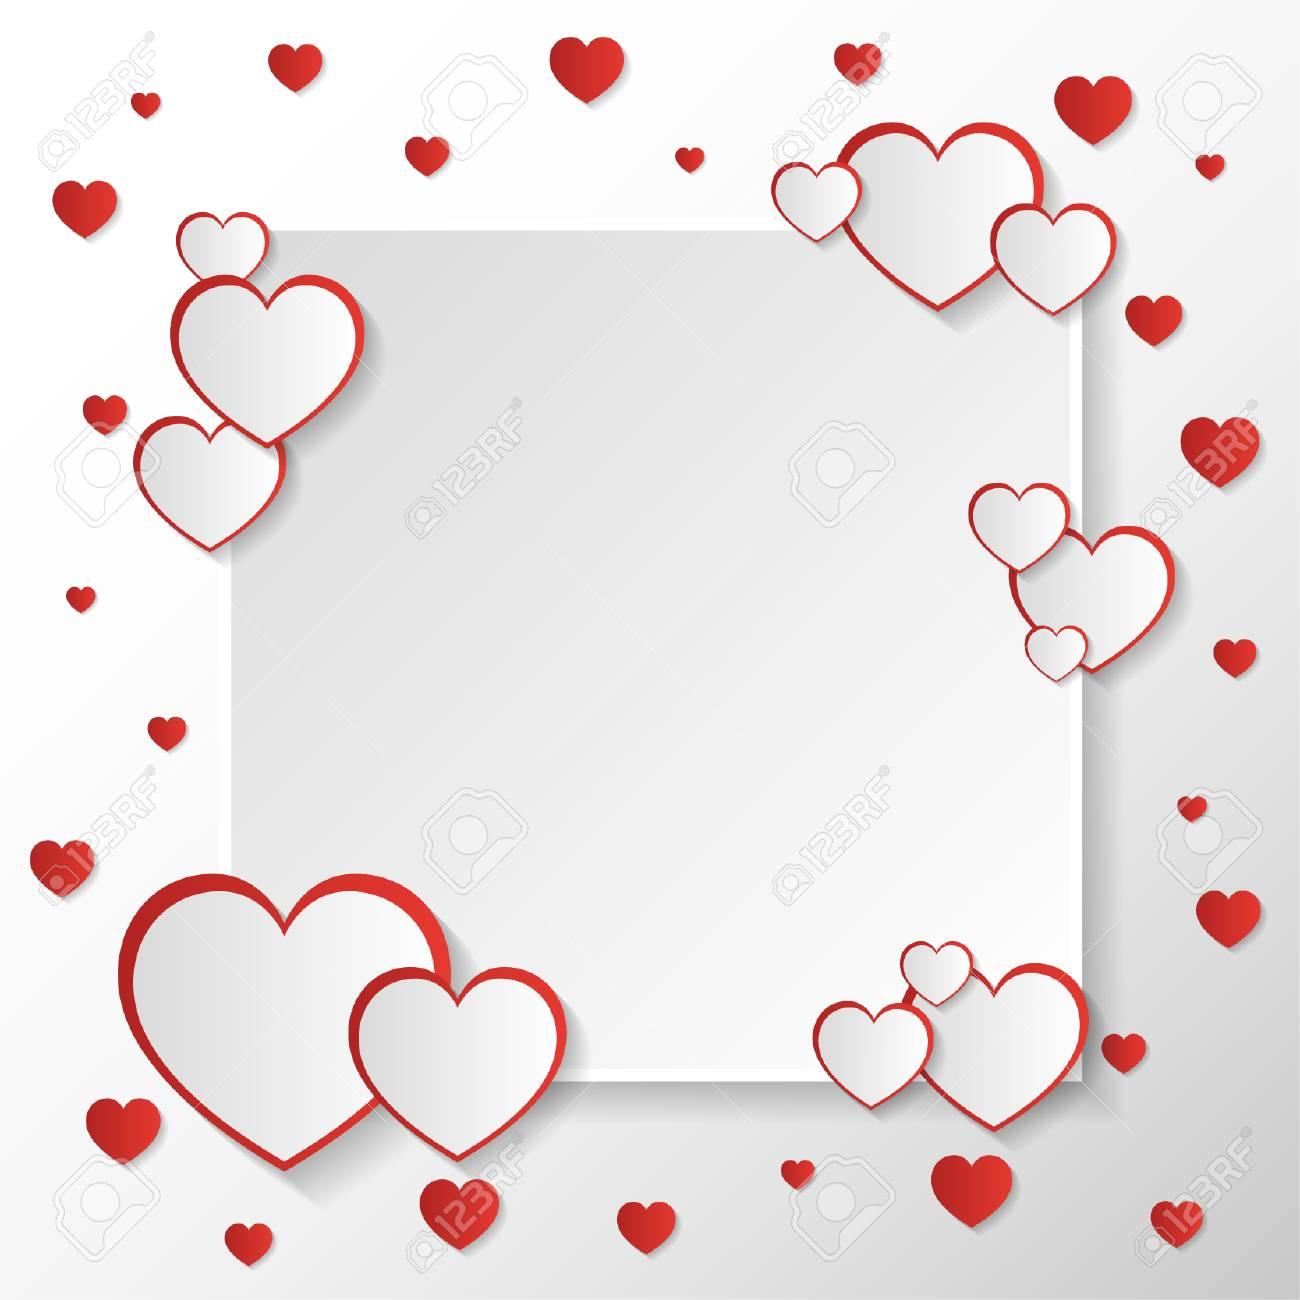 San Valentine Invitation Card Composition With White Square Space